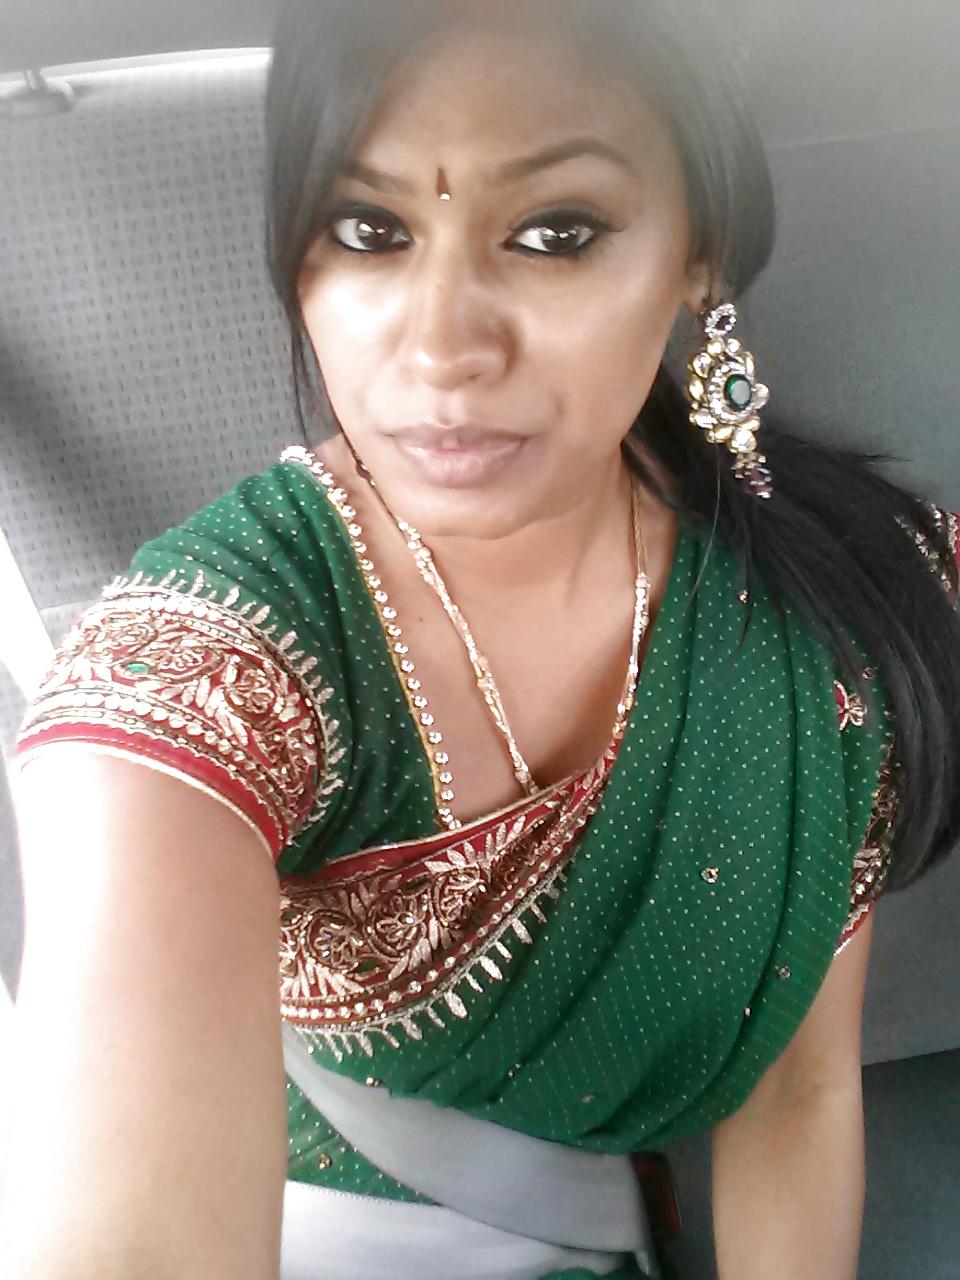 Desi girl naked rep flim site message